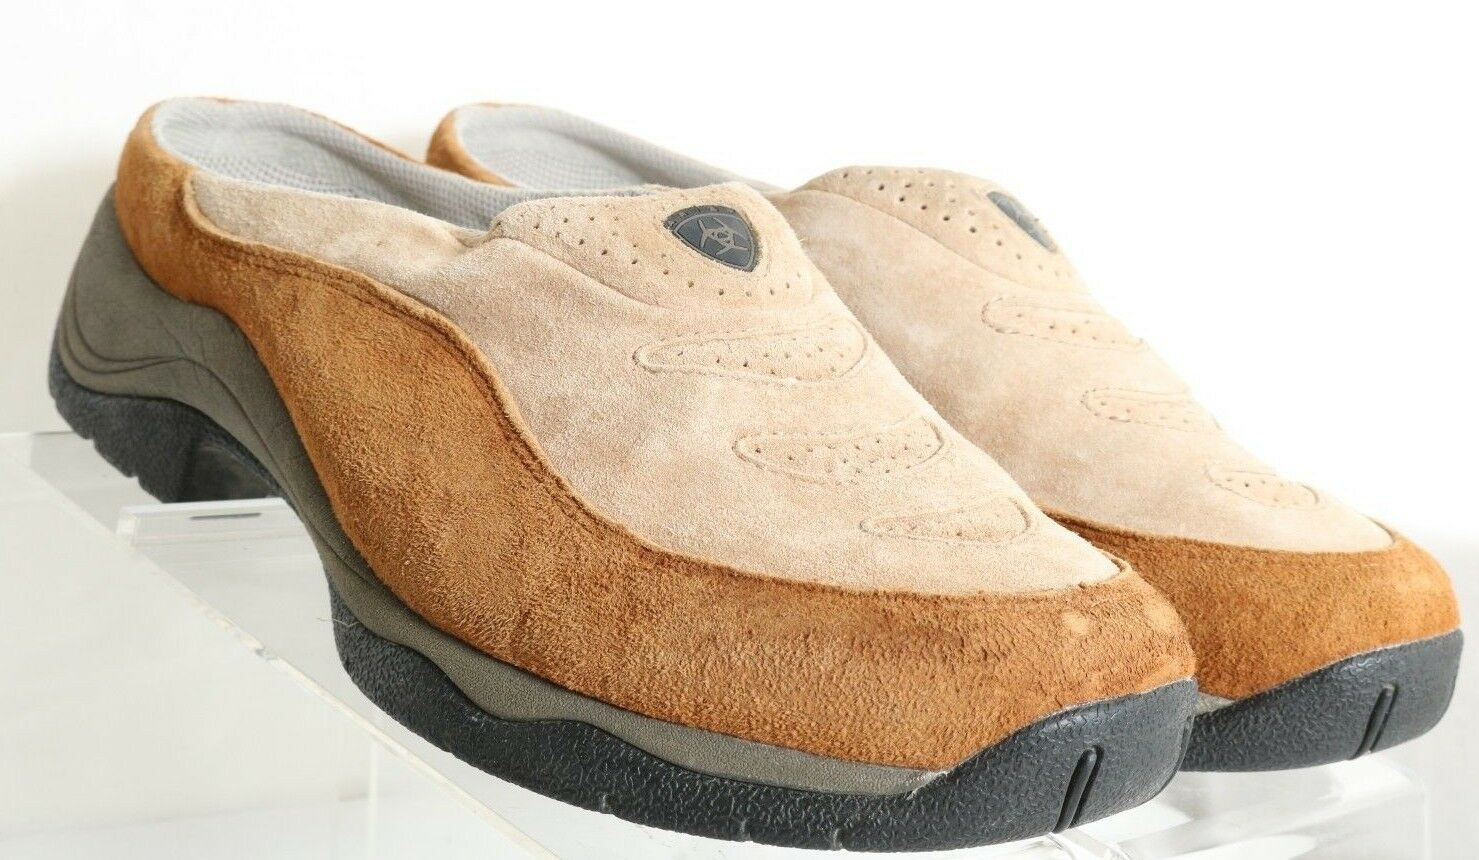 Ariat ATS Technology Tan Slip-On Comfort Mule 70223 USA Women's US 10 B